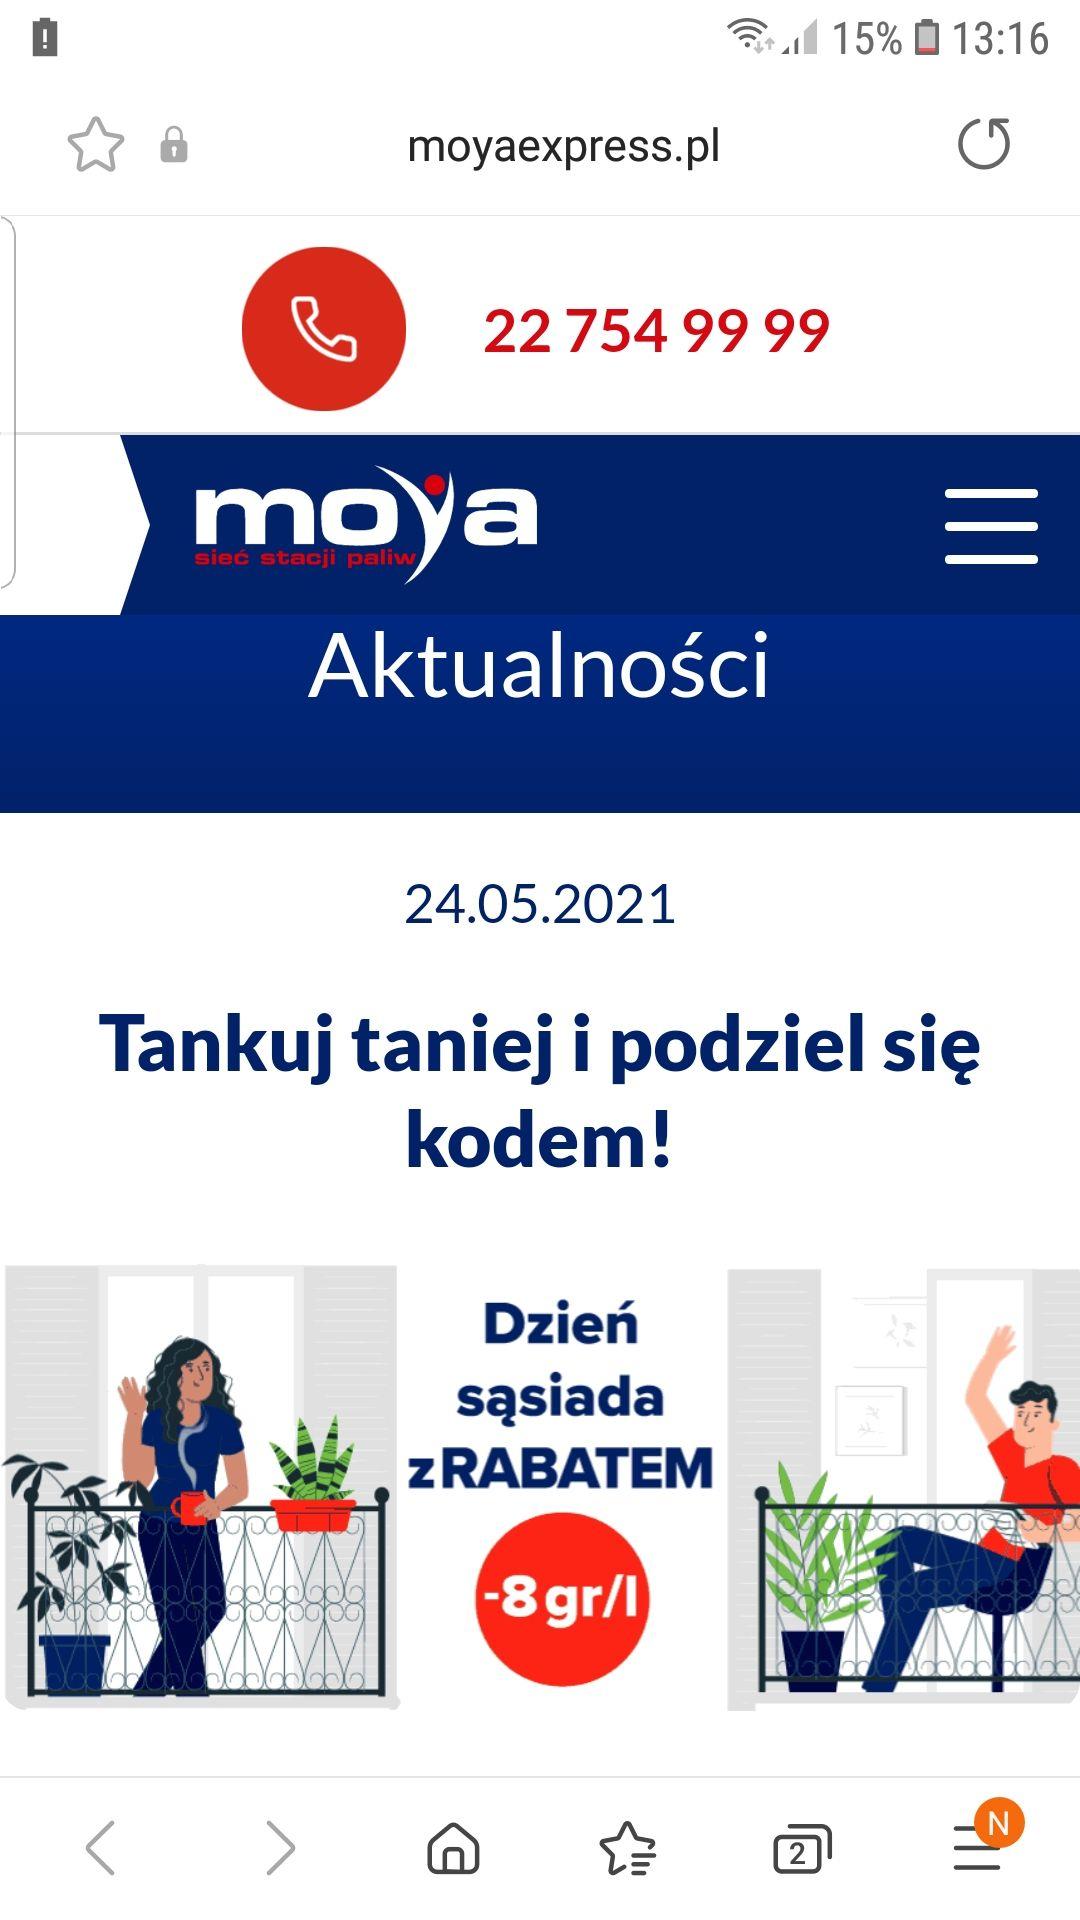 Tankuj taniej o 0.8gr na 1l paliwa na stacjach MOYA